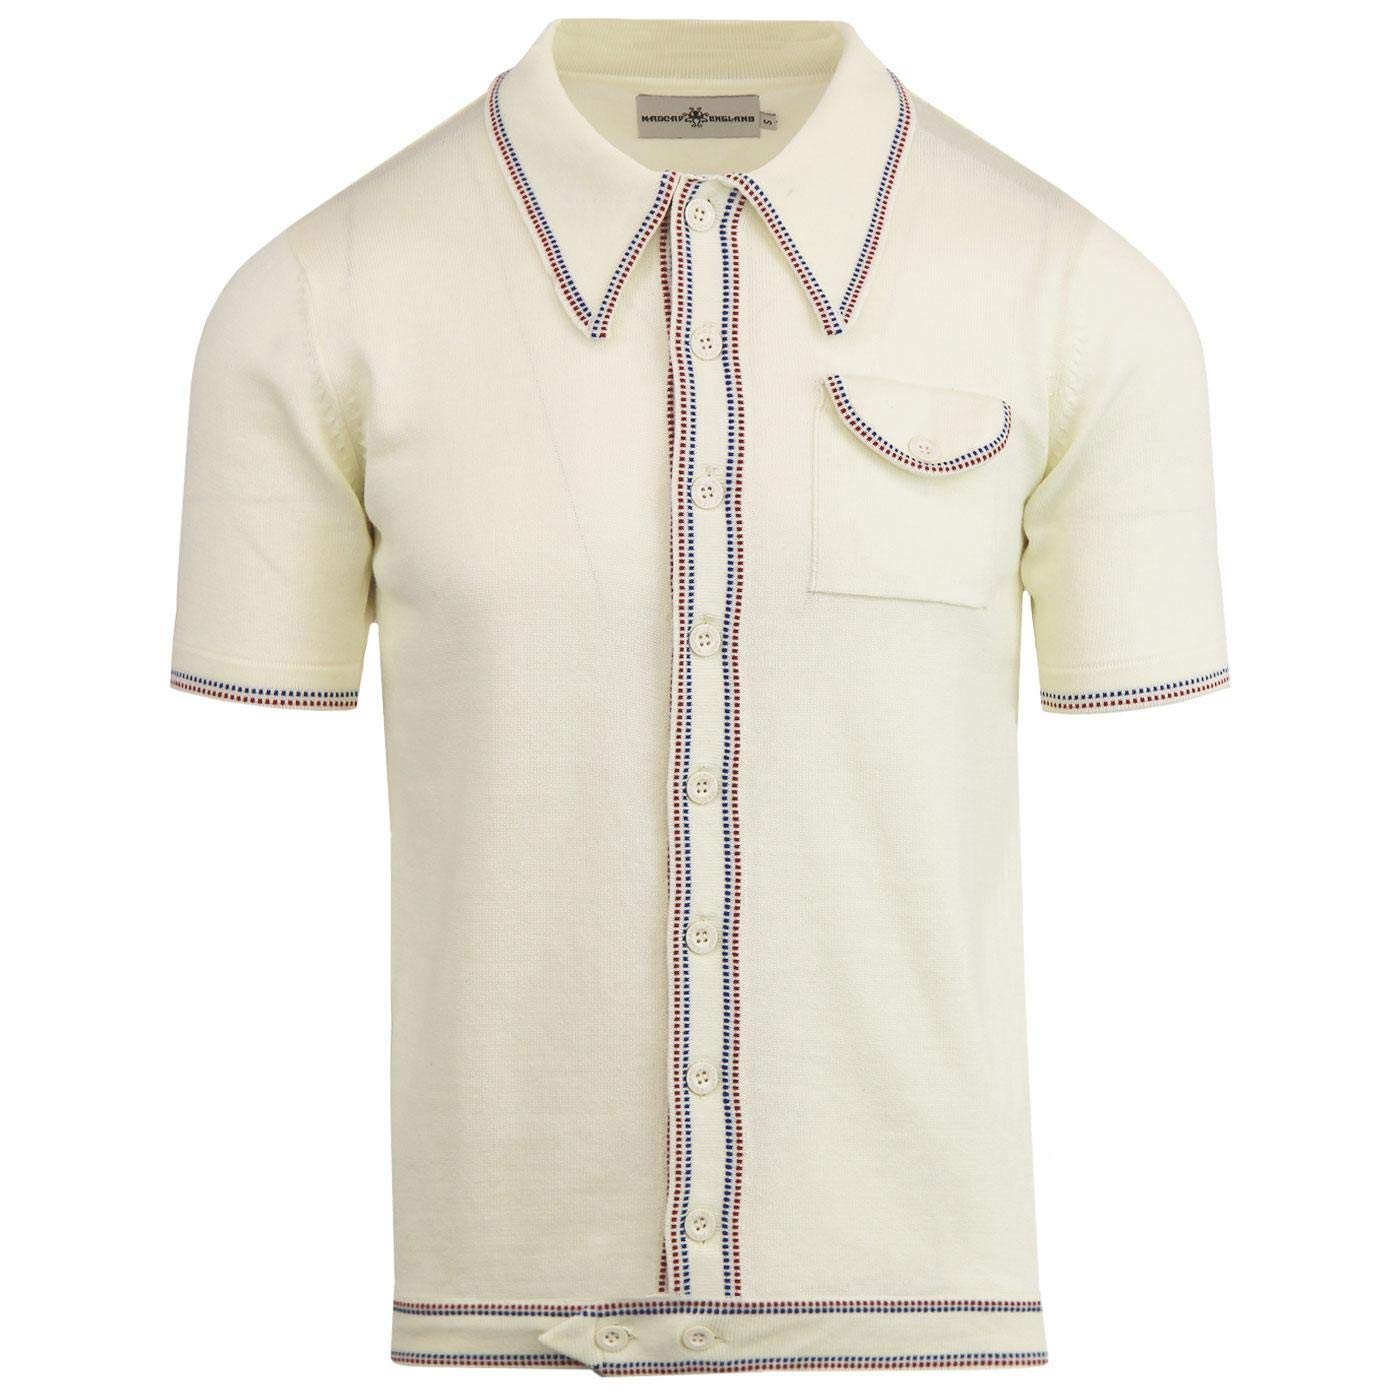 1960s -1970s Men's Clothing Madcap England Crawdaddy Micro Dash Knit Polo Caramel MC166 £34.99 AT vintagedancer.com